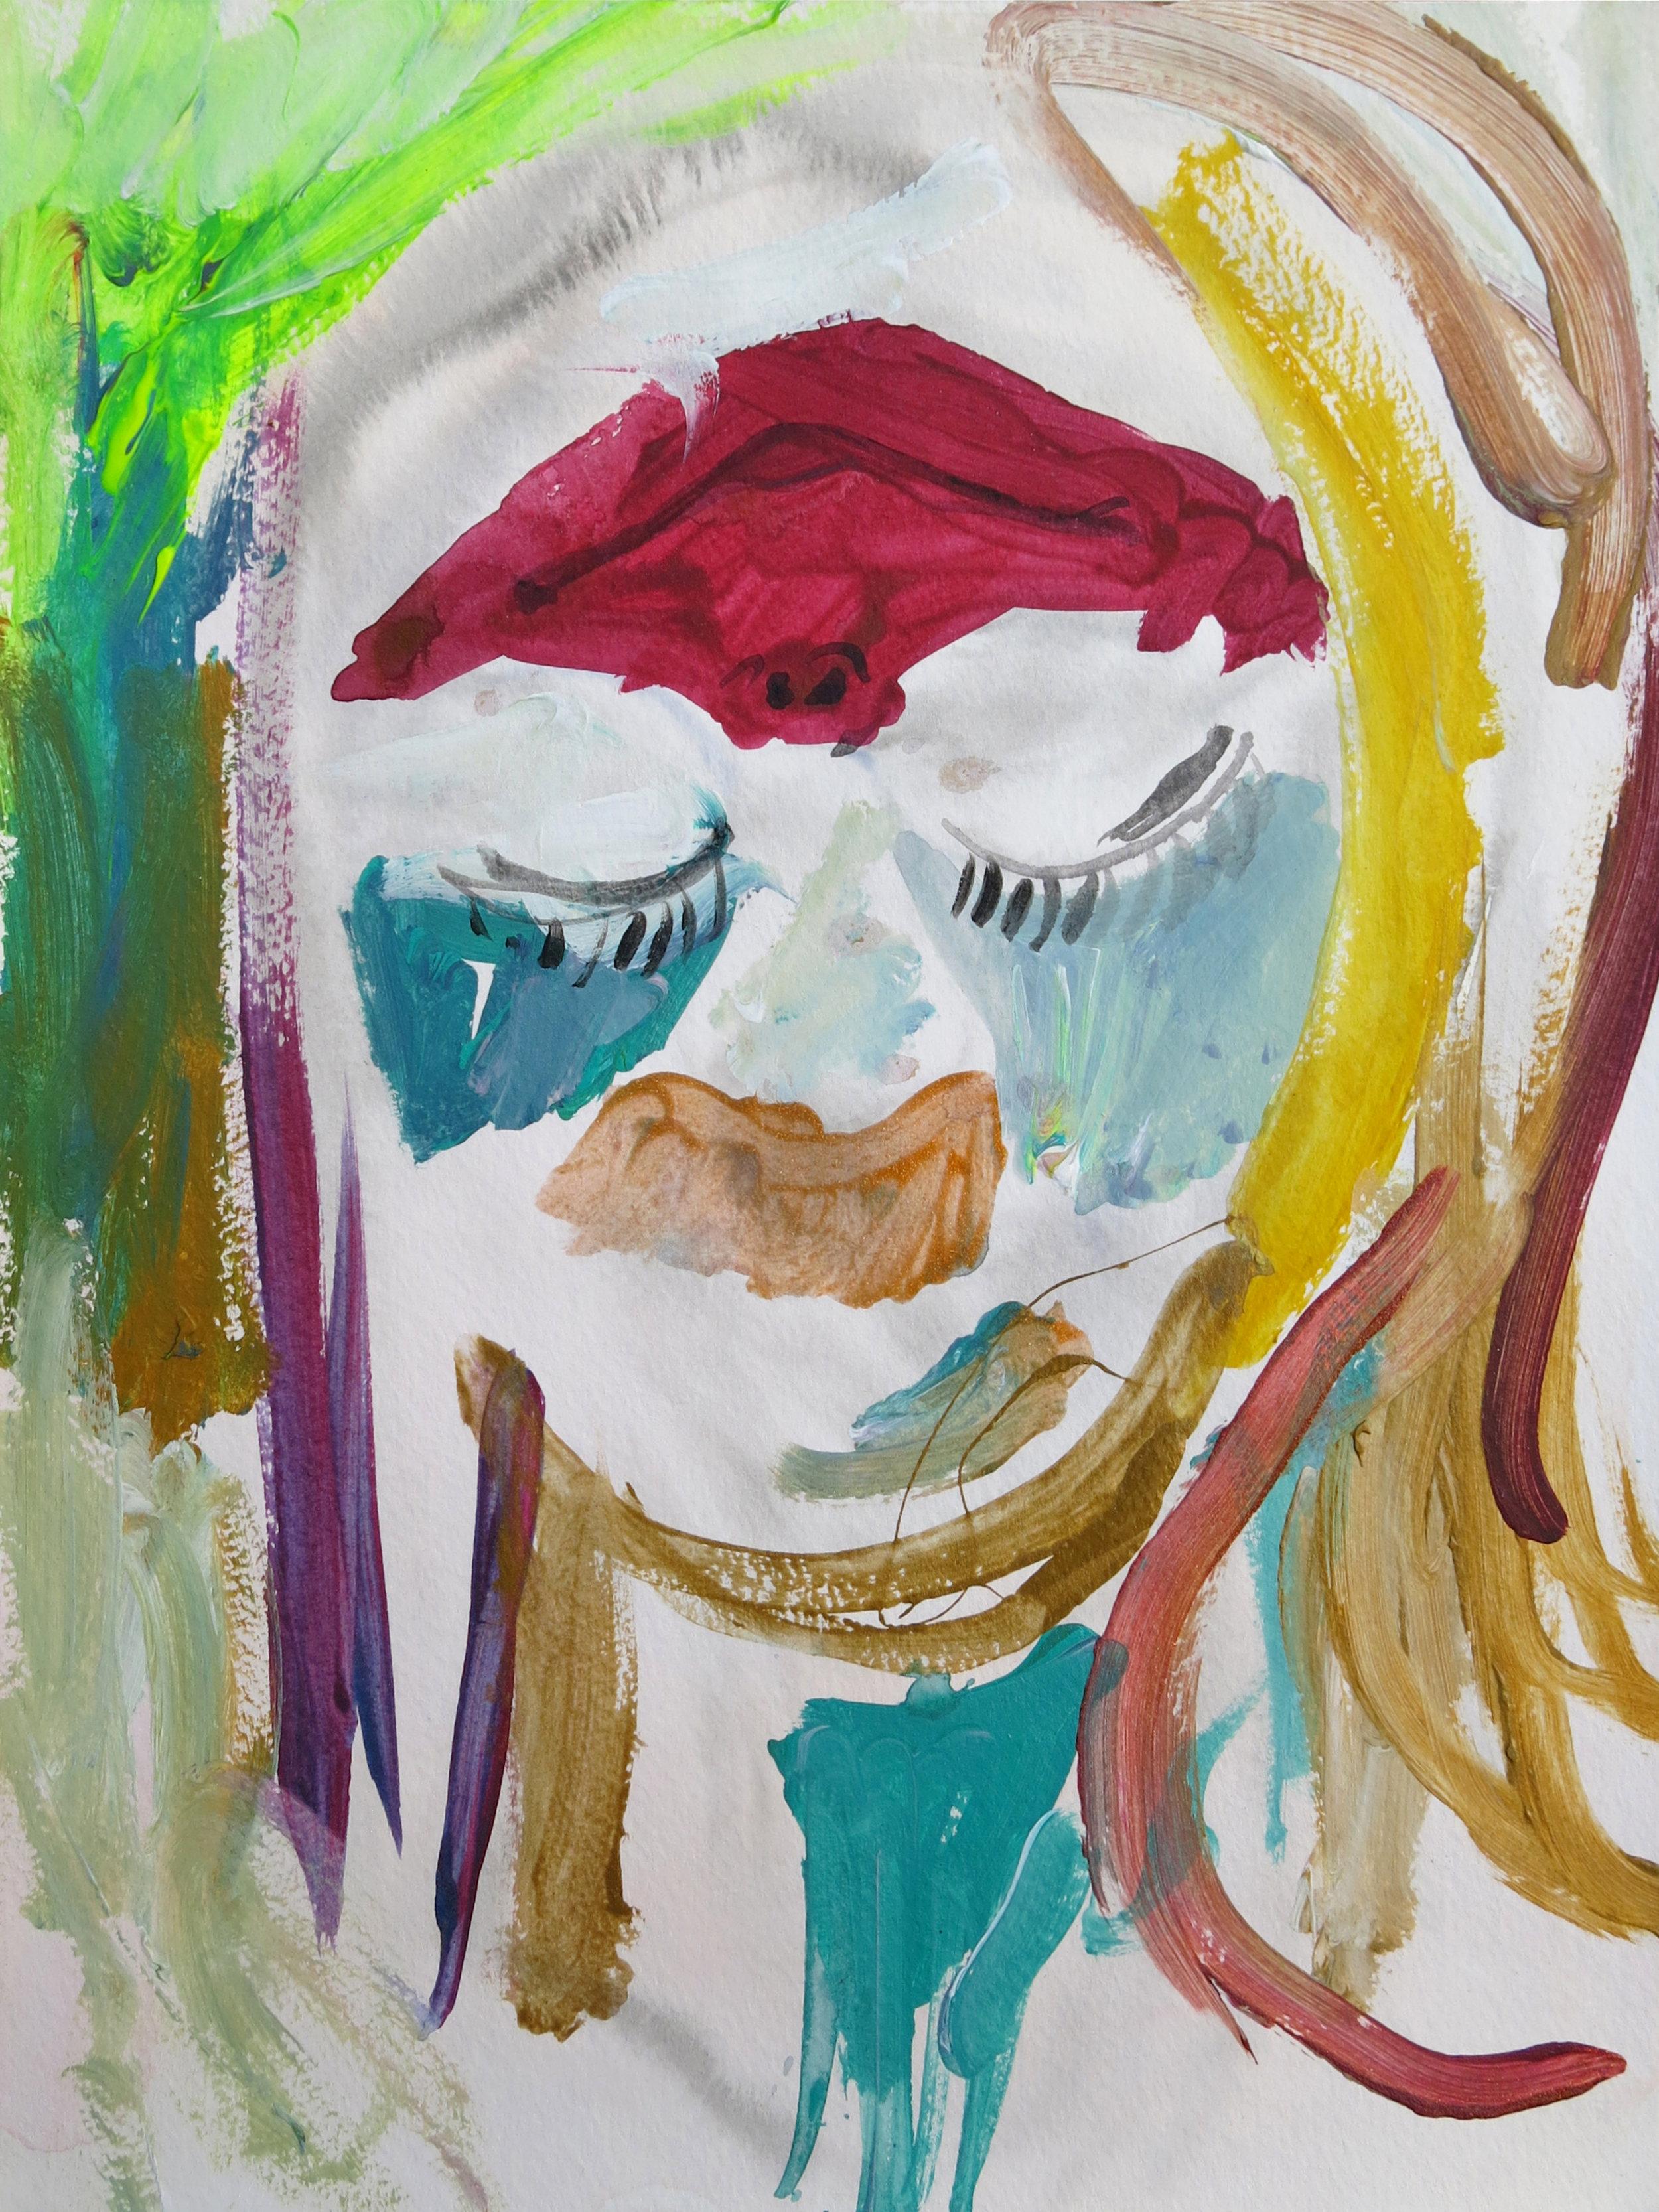 Barbra Streisand Portrait #144